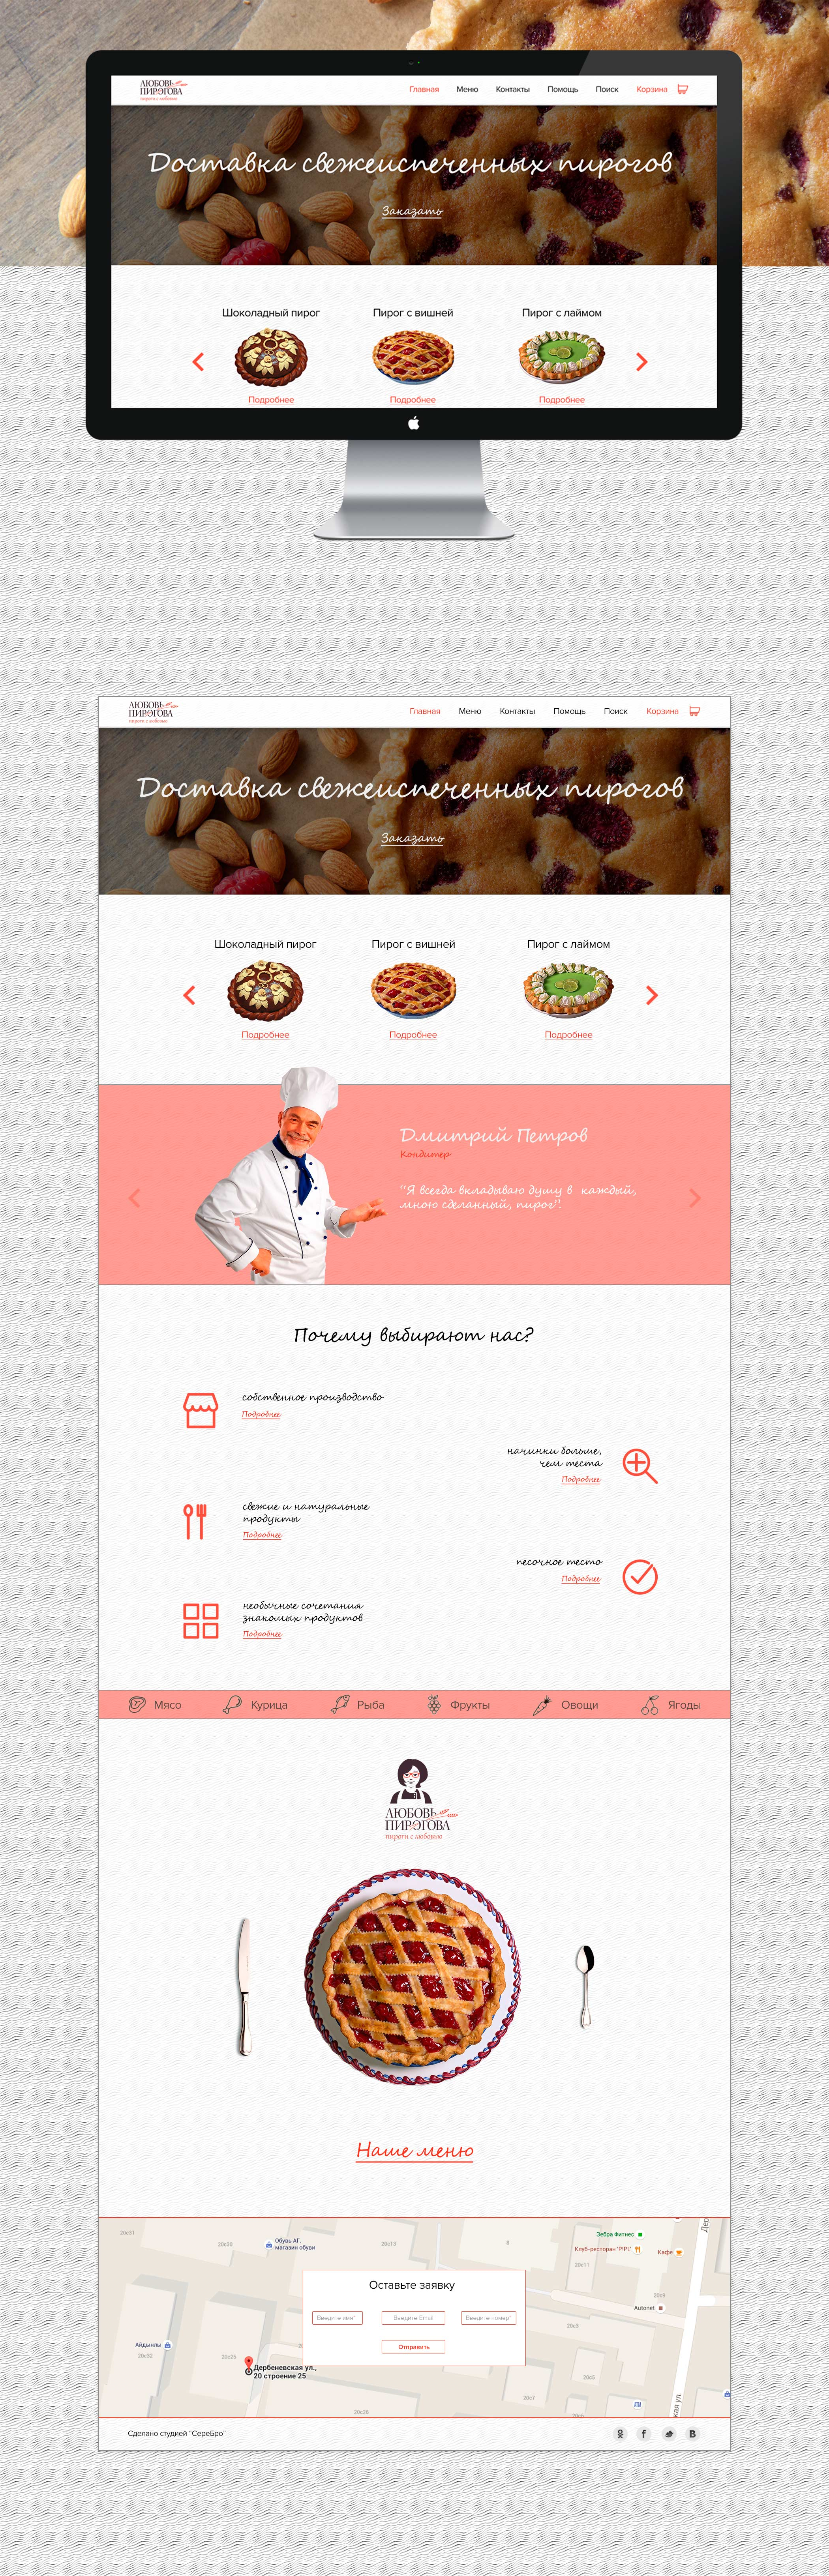 Разработка дизайна сайта lovepirogova.ru фото f_97356b740e3a5072.jpg